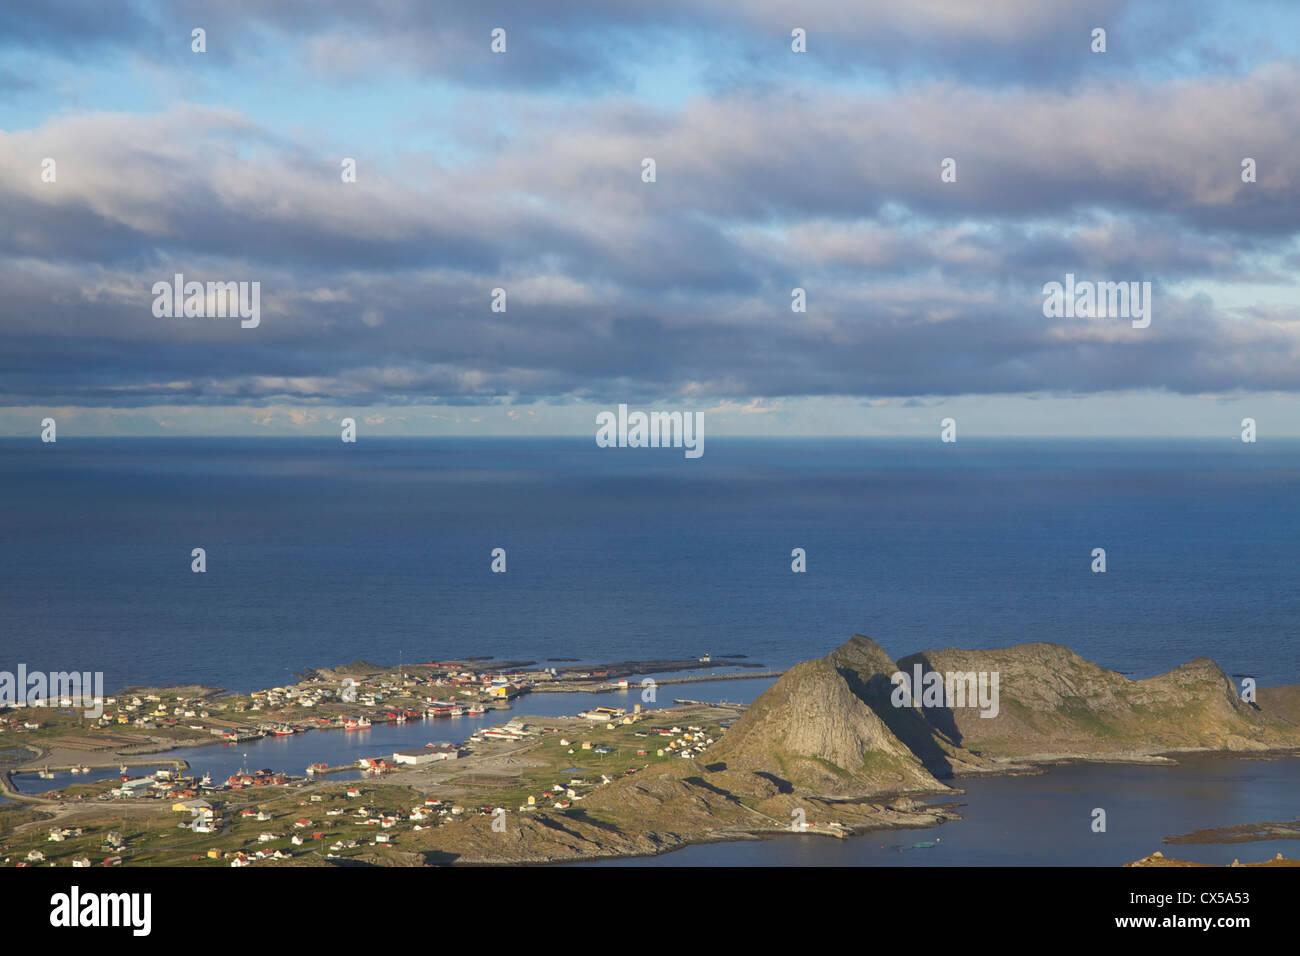 Town of Sorland on island of Vaeroy on Lofoten islands, Norway - Stock Image